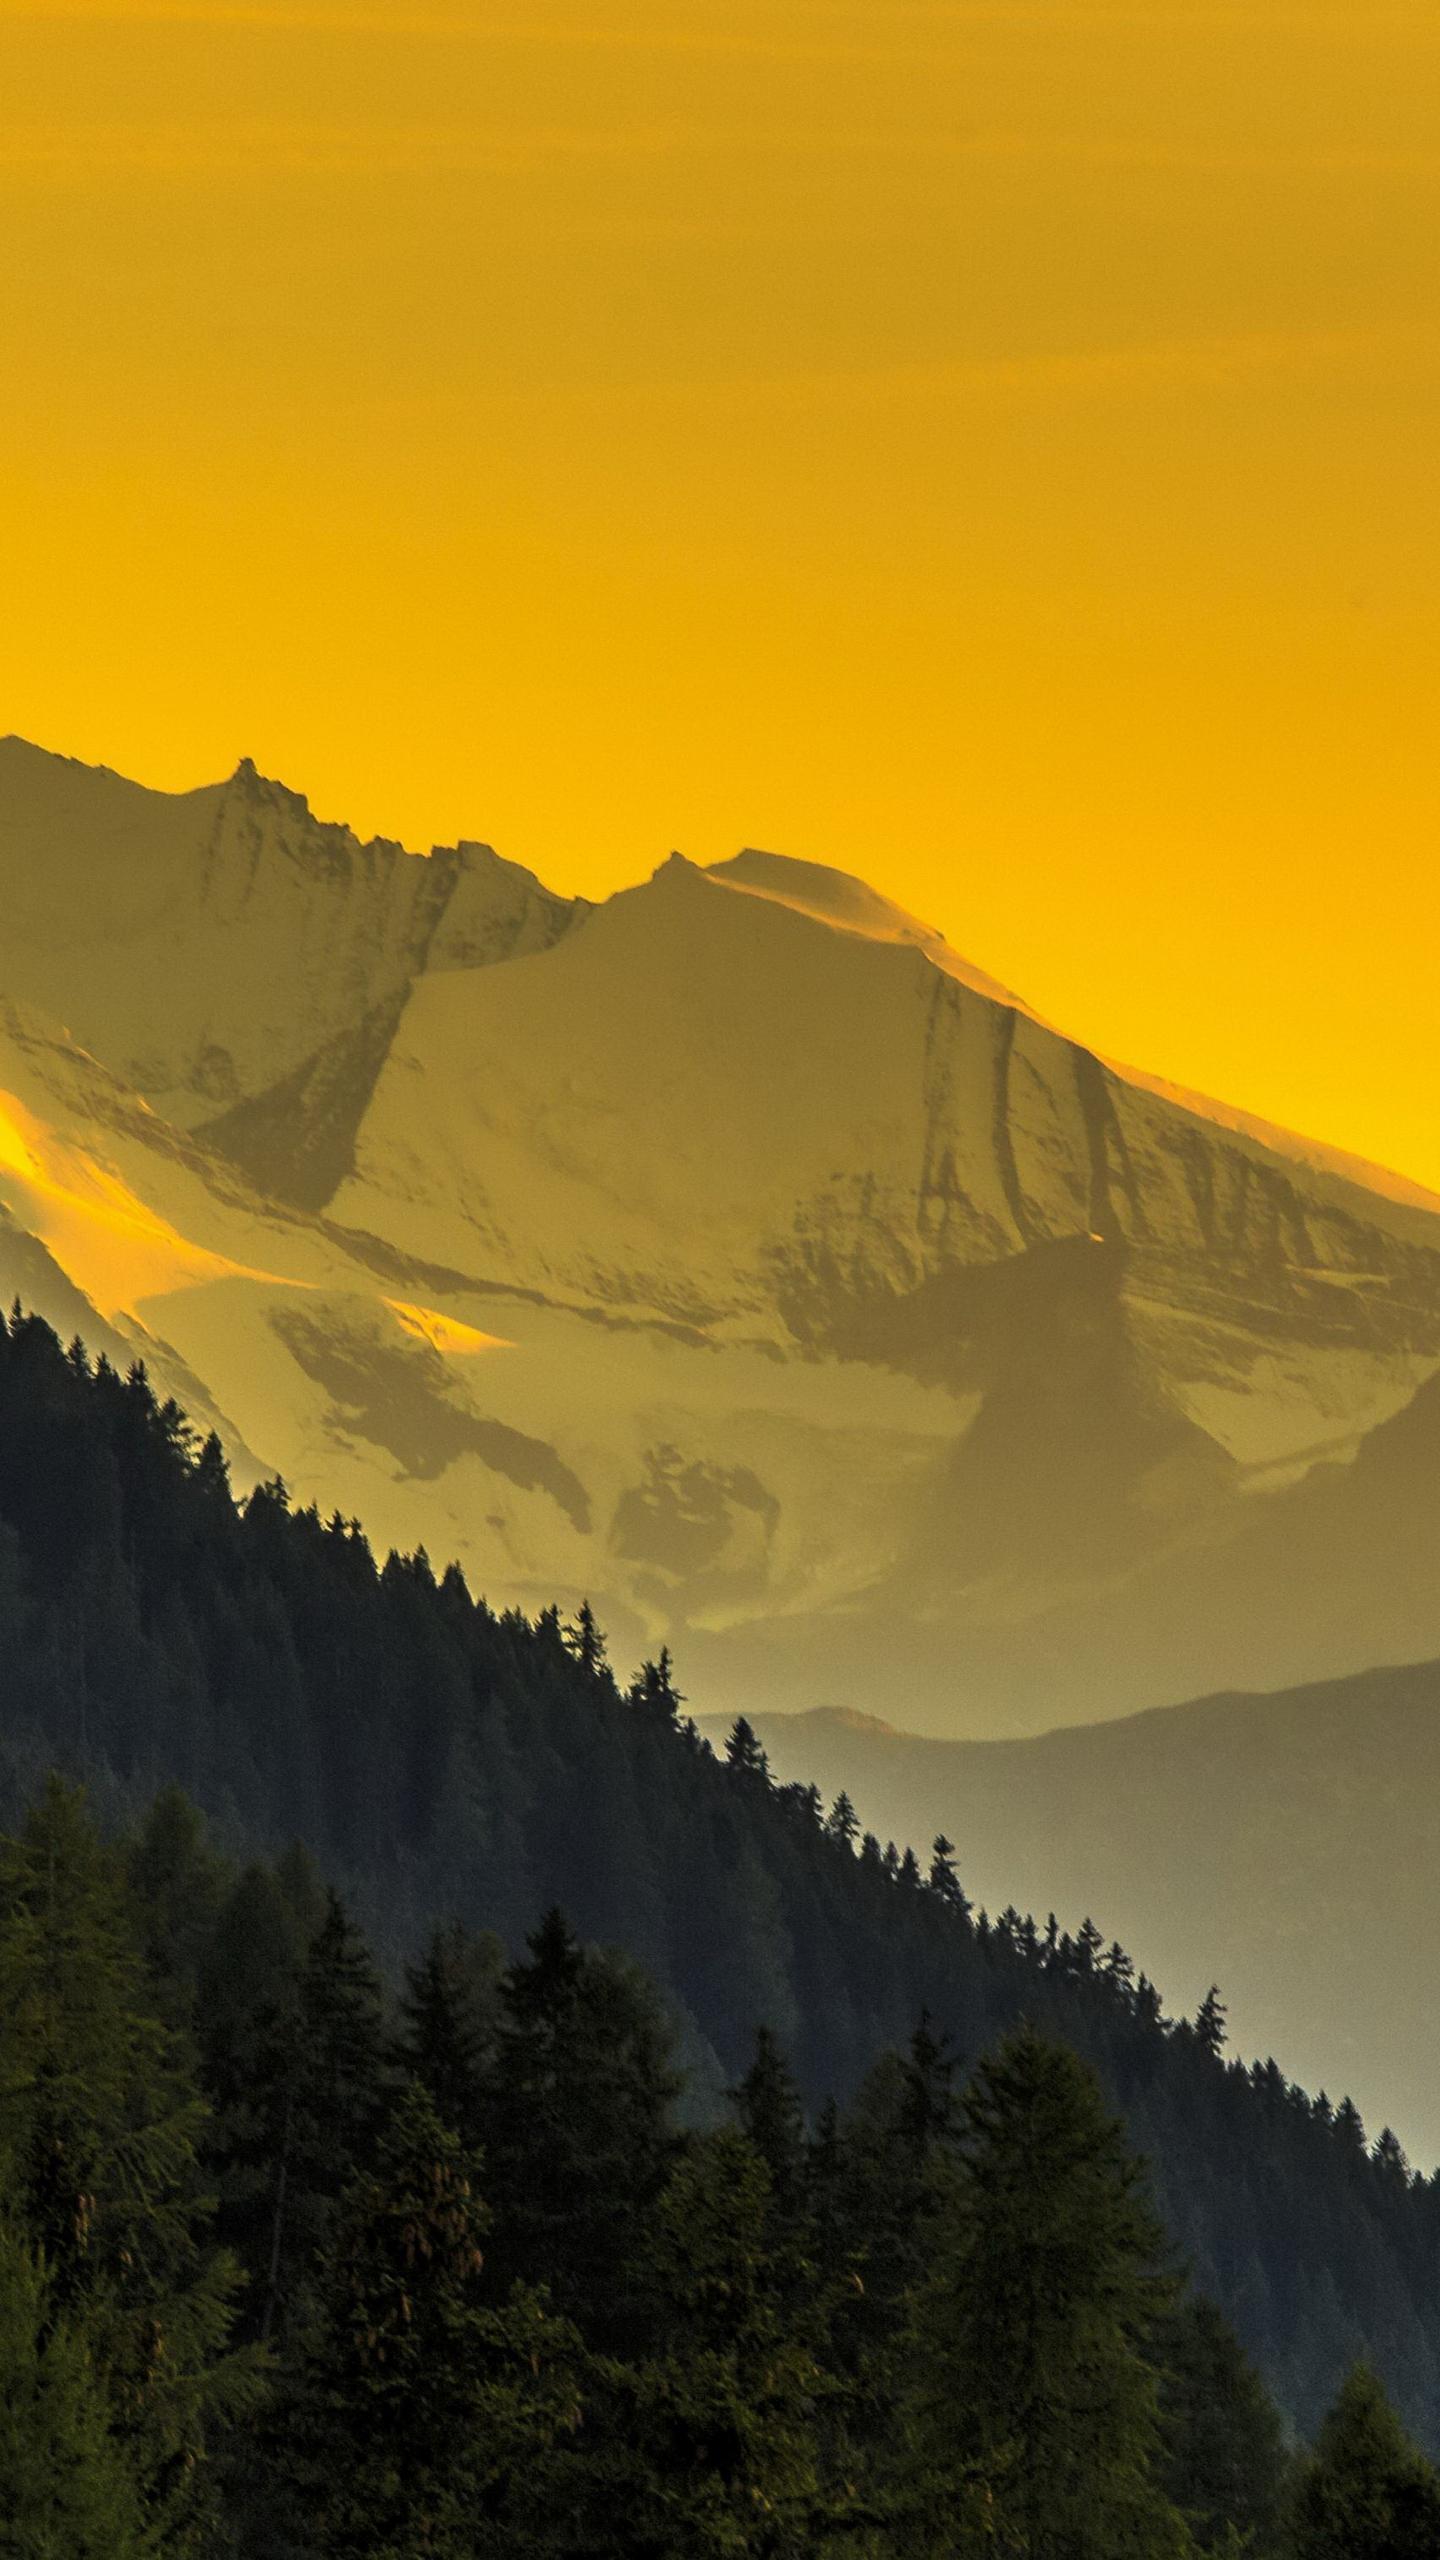 Download 1440x2560 Wallpaper Mountains Horizon Dawn Sunrise Yellow Sky Nature Qhd Samsung Galaxy S6 S7 Edge Note Lg G4 1440x2560 Hd Image Background 10047